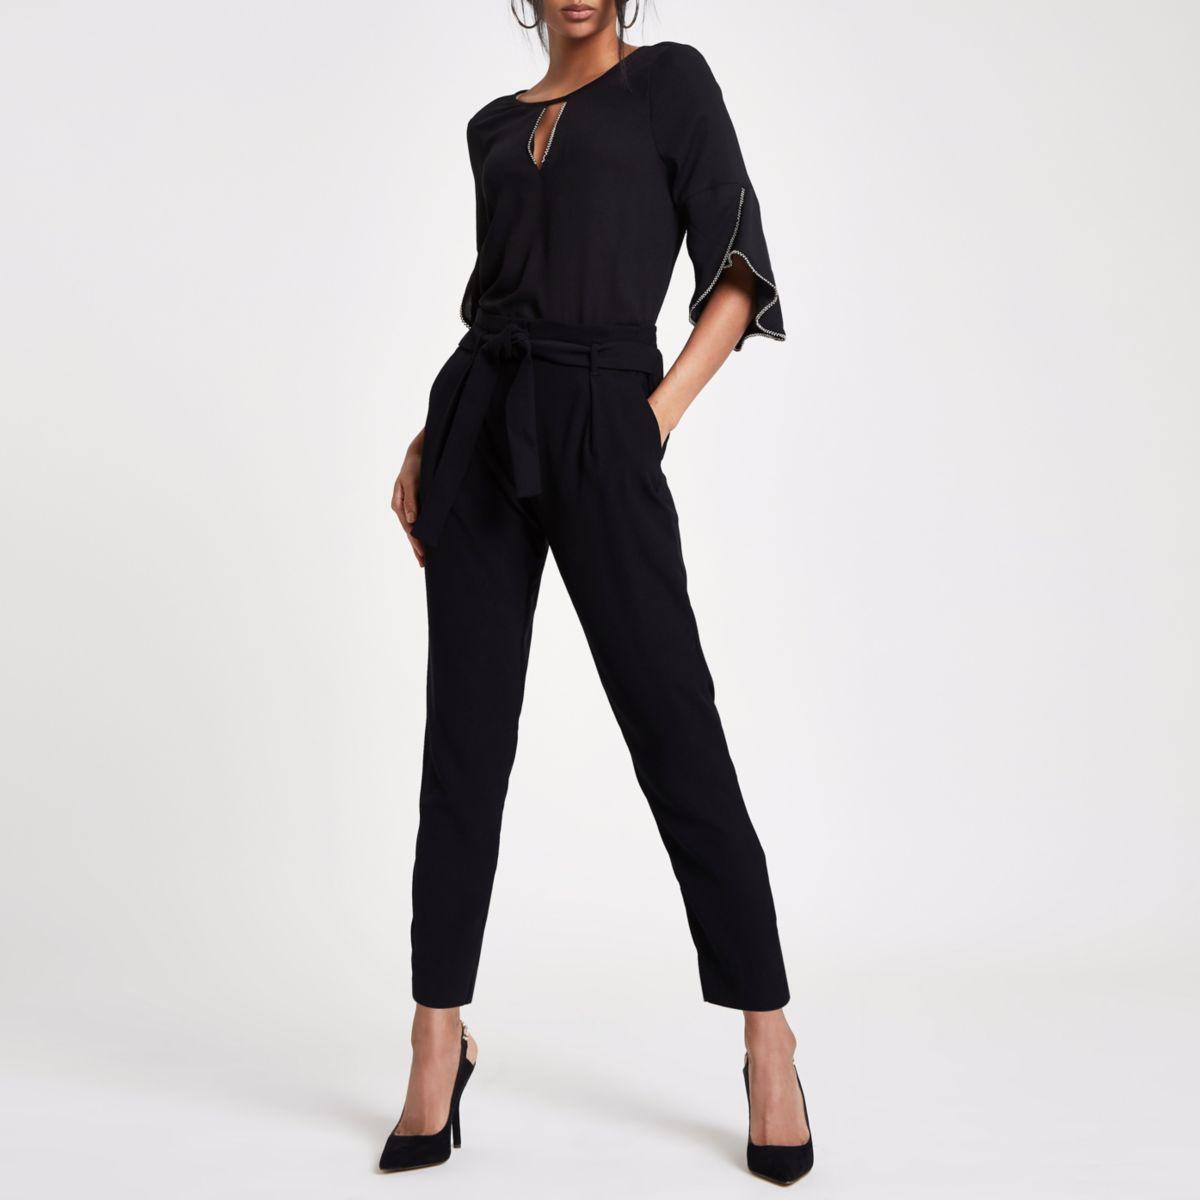 Black beaded frill sleeve blouse